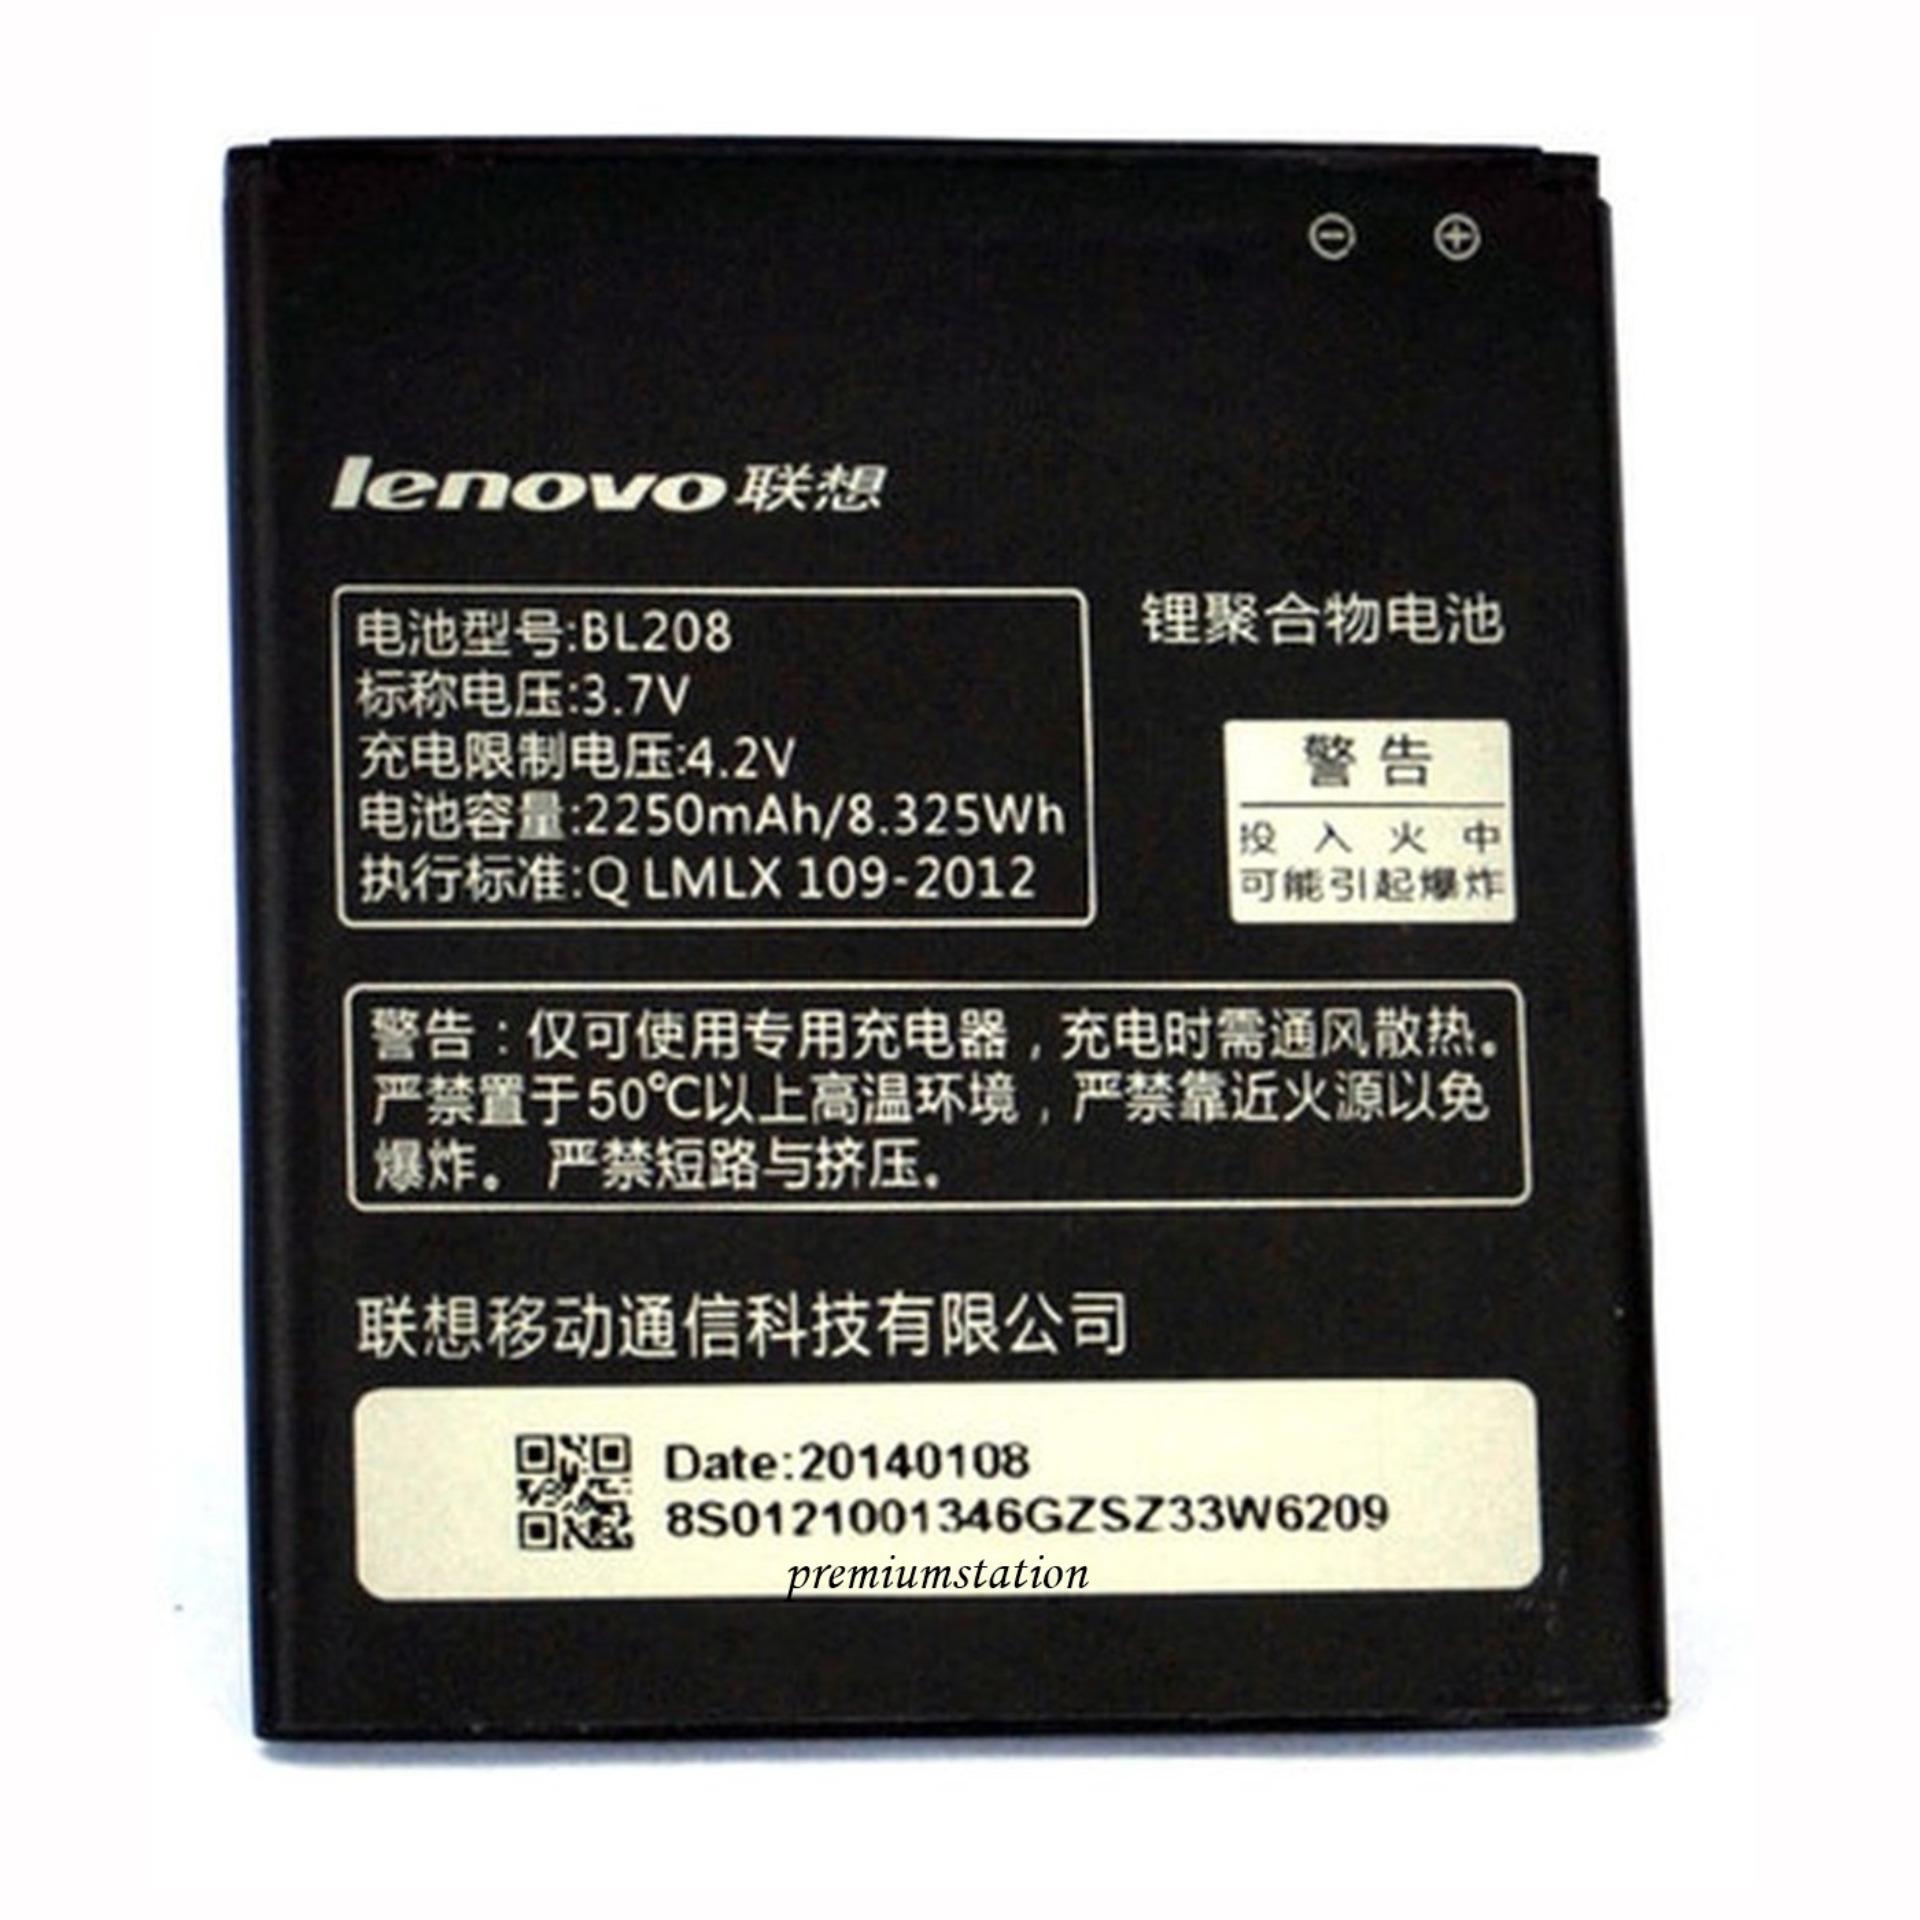 Jual Lenovo Baterai Type Bl 208 For Lenovo S820 A656 A658T 2000 Mah Capacity 3 7V Grosir